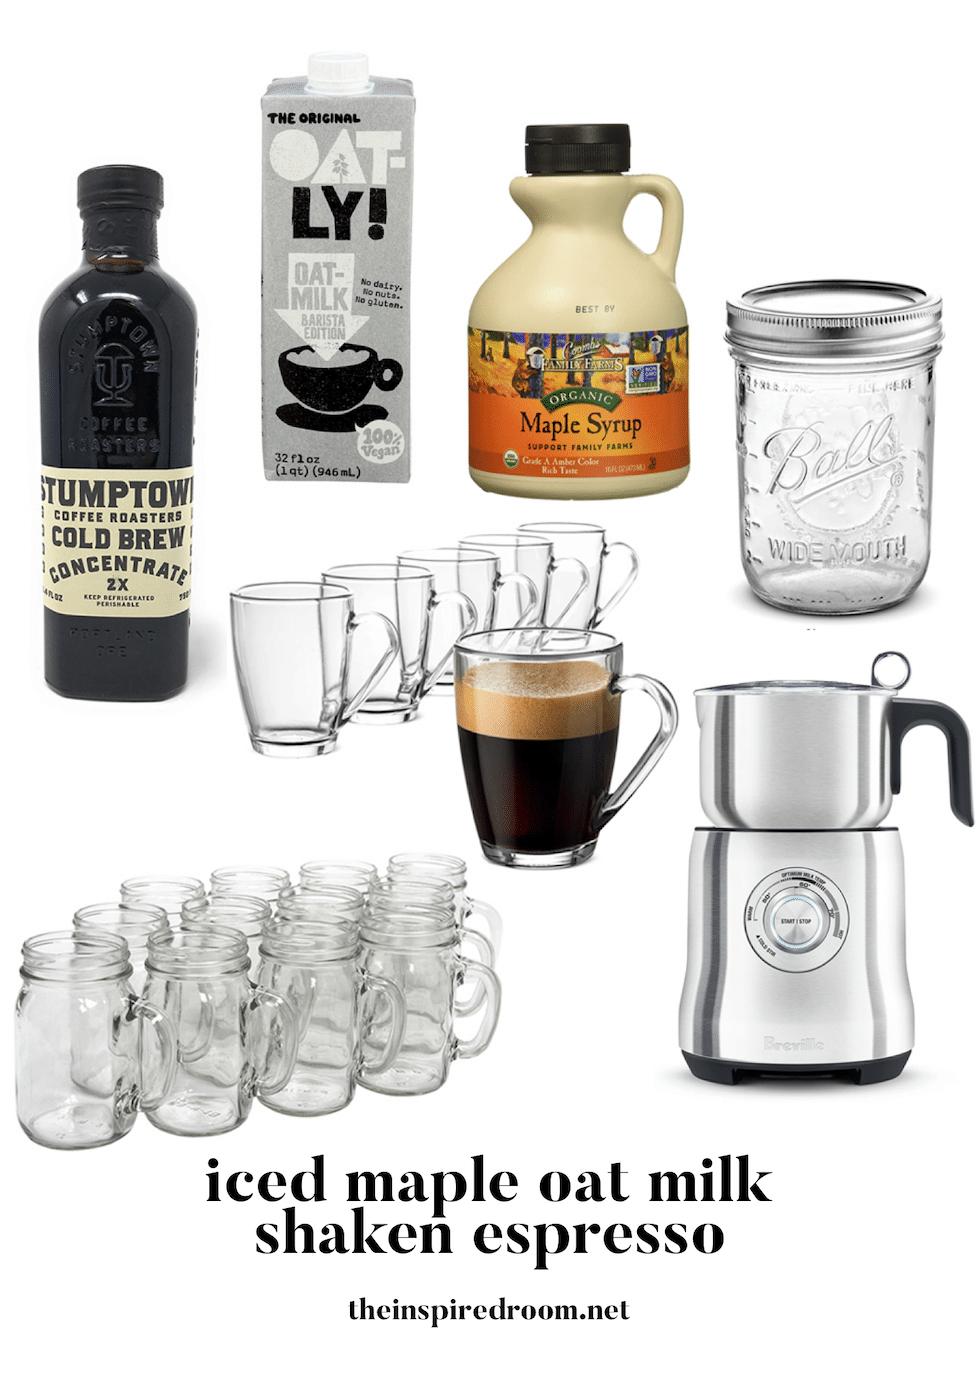 Iced Maple Oat Milk Shaken Espresso Recipe (Starbucks Copycat)